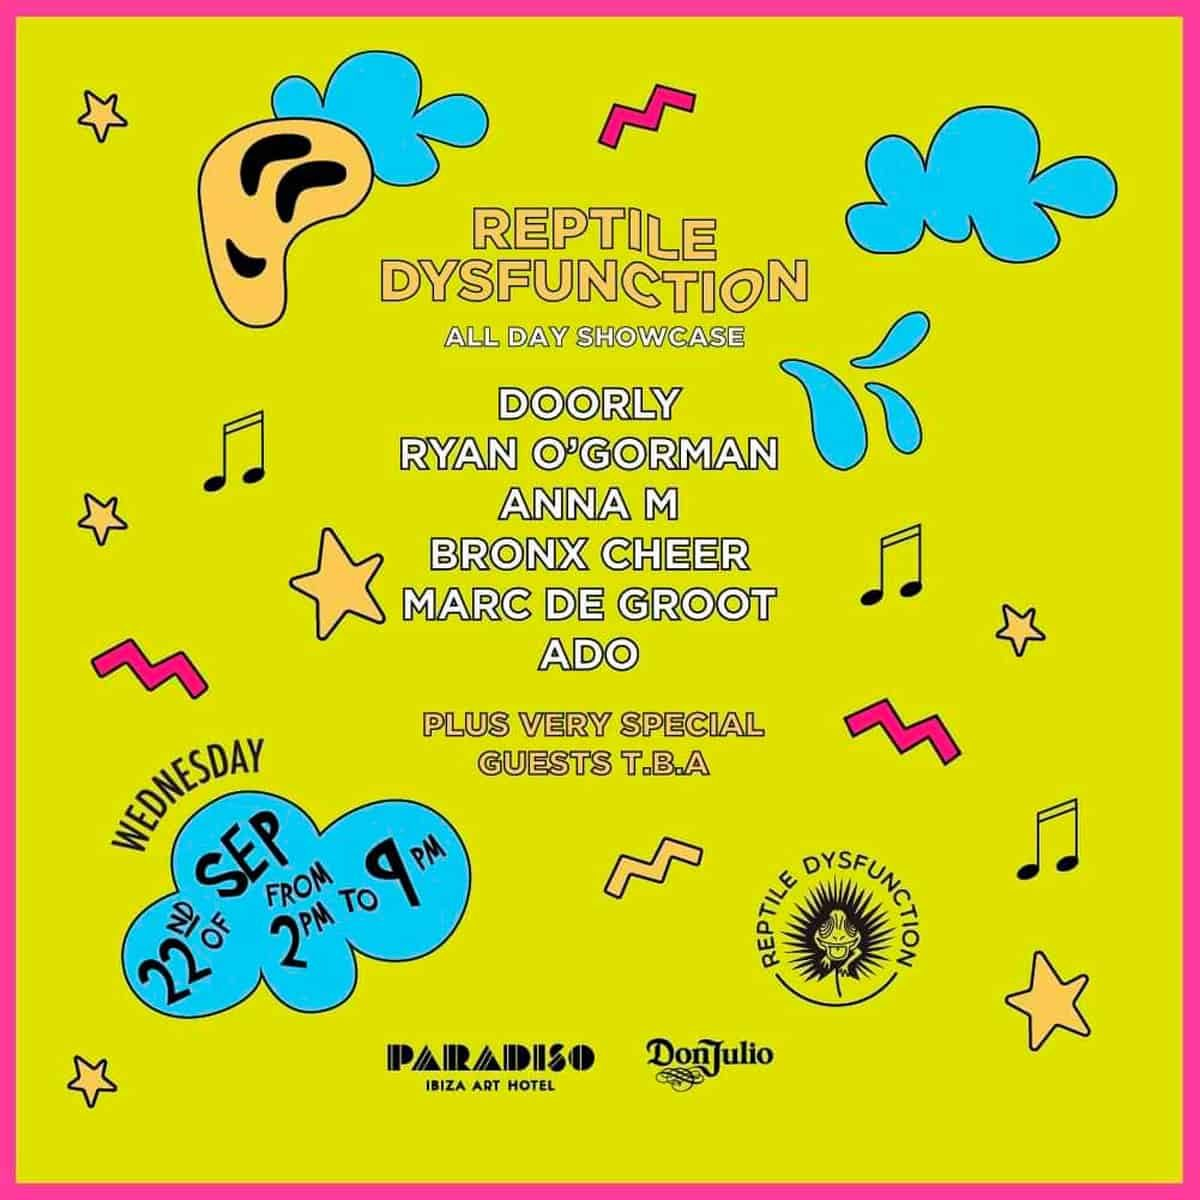 reptile-dysfunction-showcase-paradiso-ibiza-art-hotel-2021-welcometoibiza